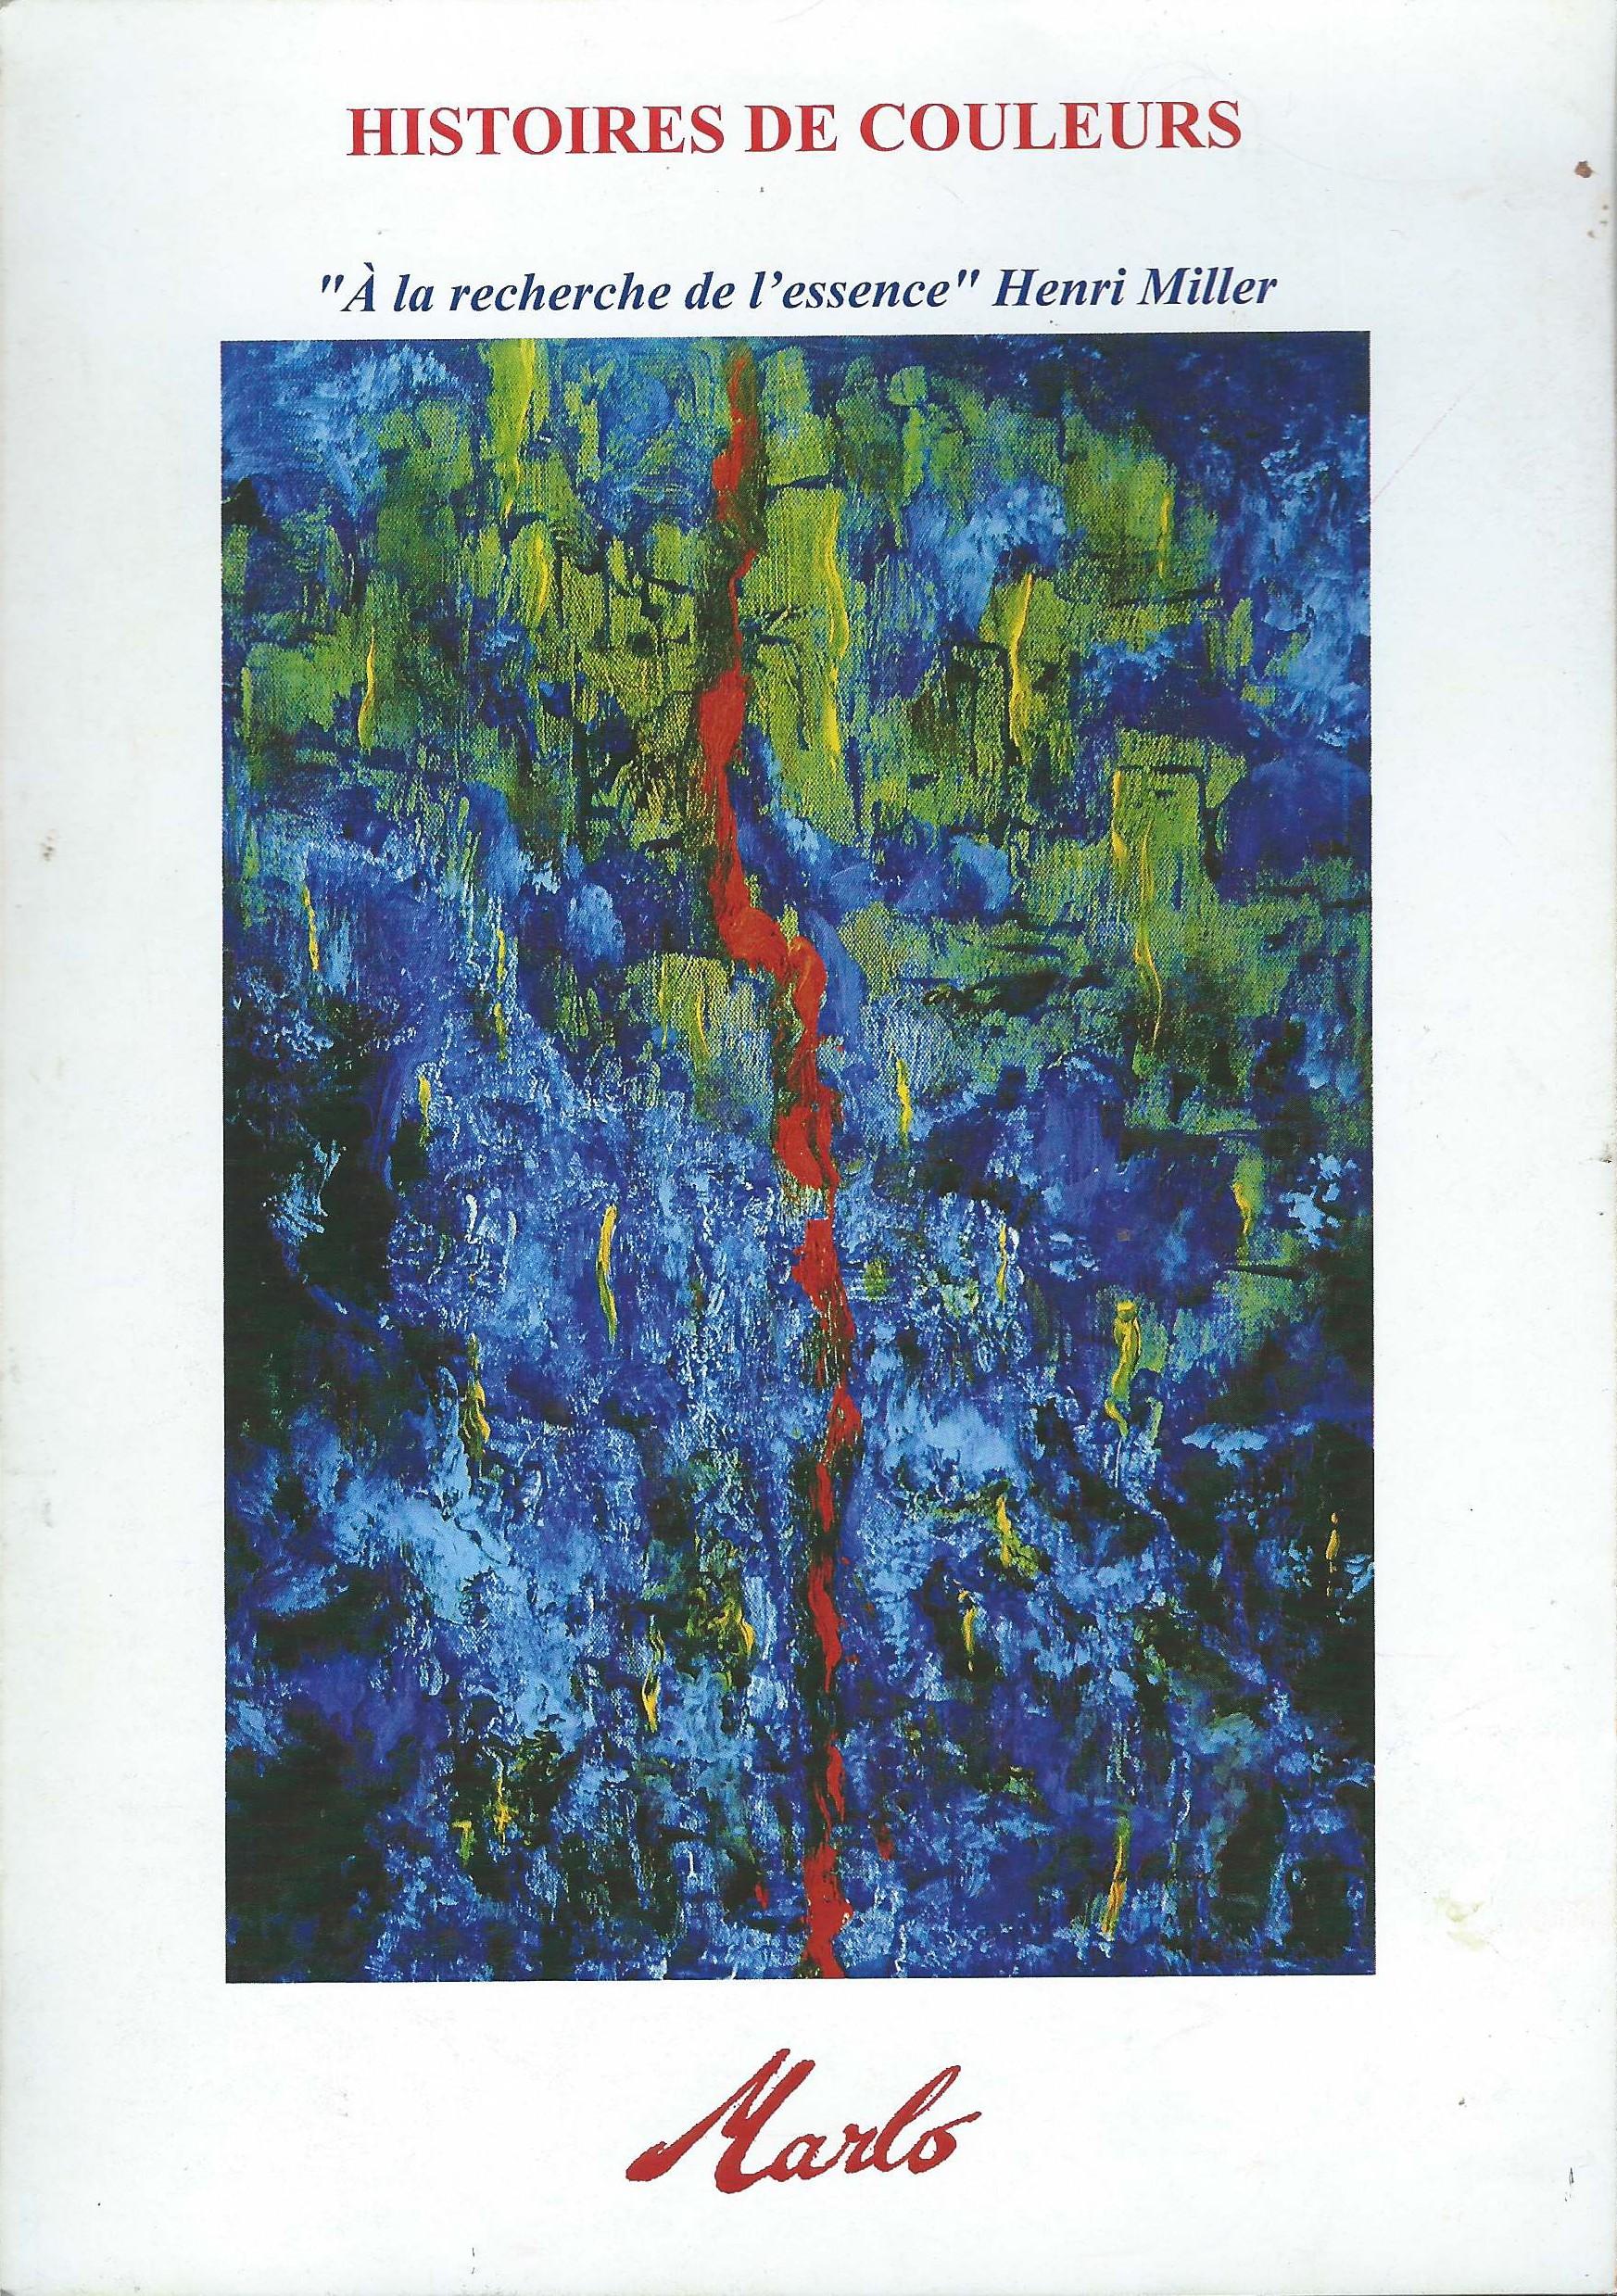 Invitation-Galerie-S.M.A.-Carouge-Genève.-27.03-24.05.2015-1